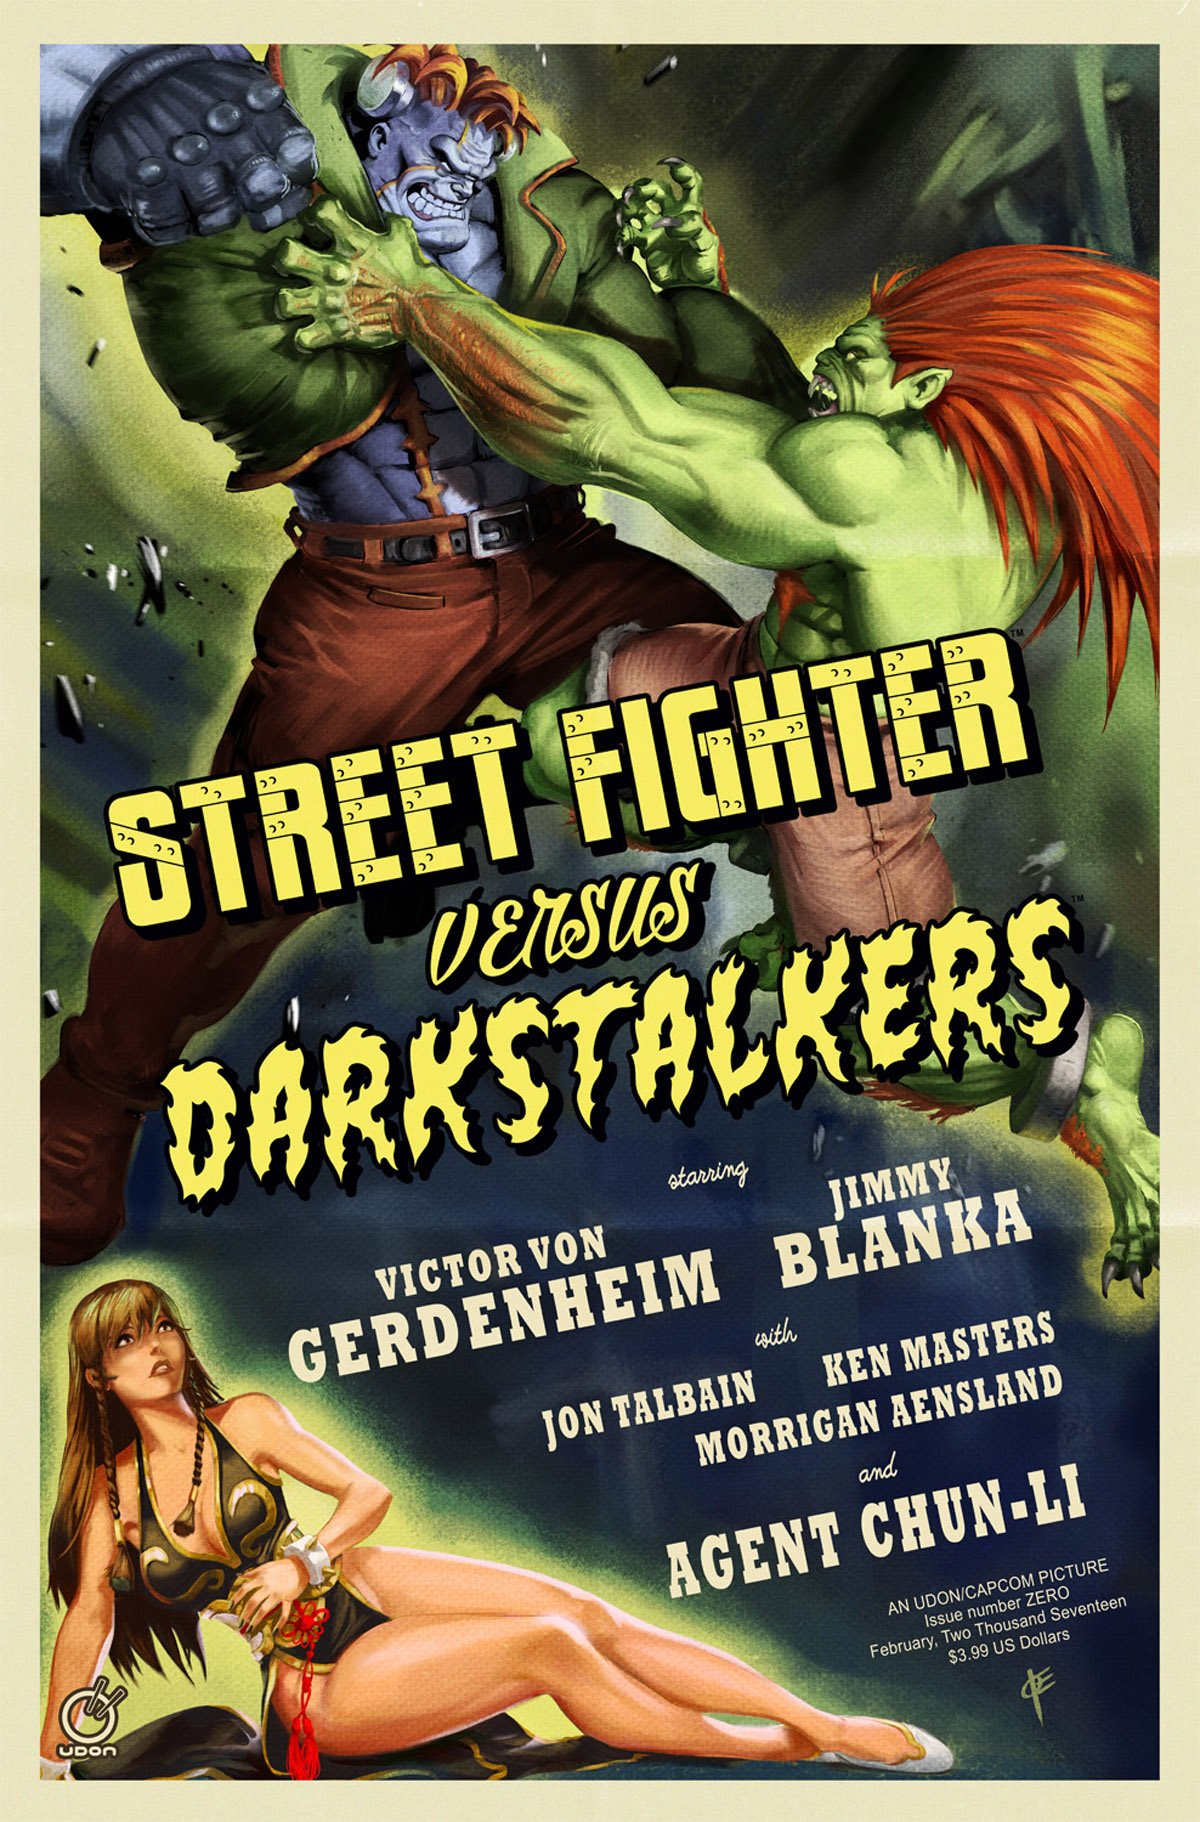 Street Fighter VS Darkstalkers 000 (February 2017) (Cover C)